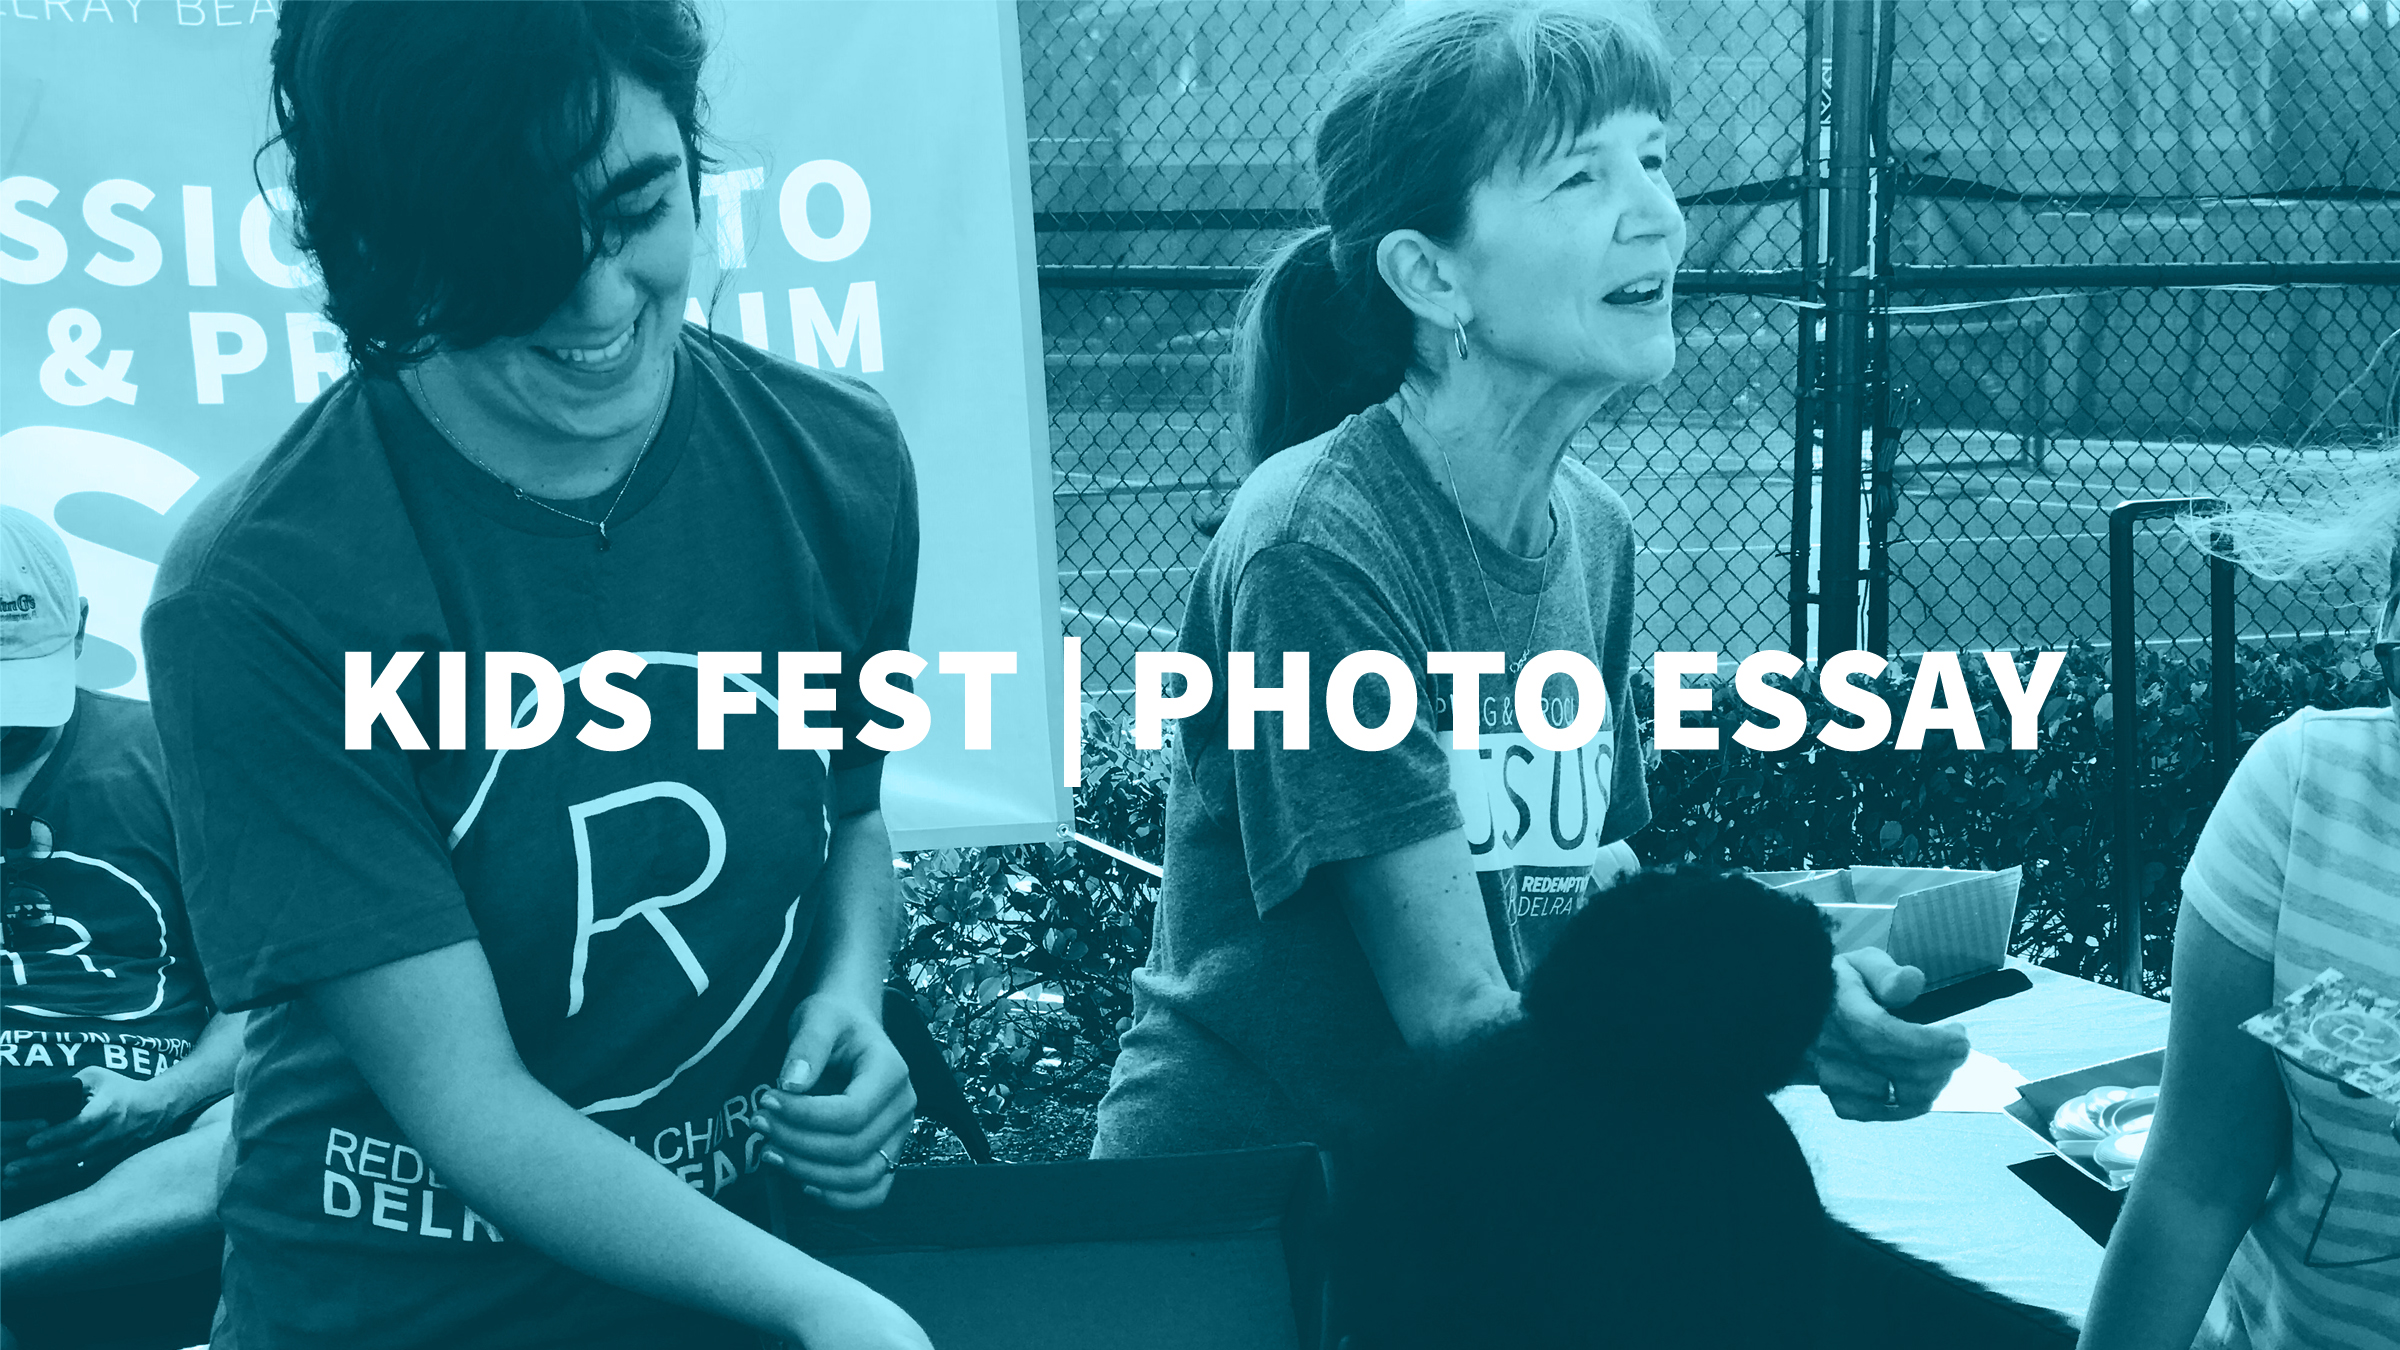 kids fest photo essay.jpg